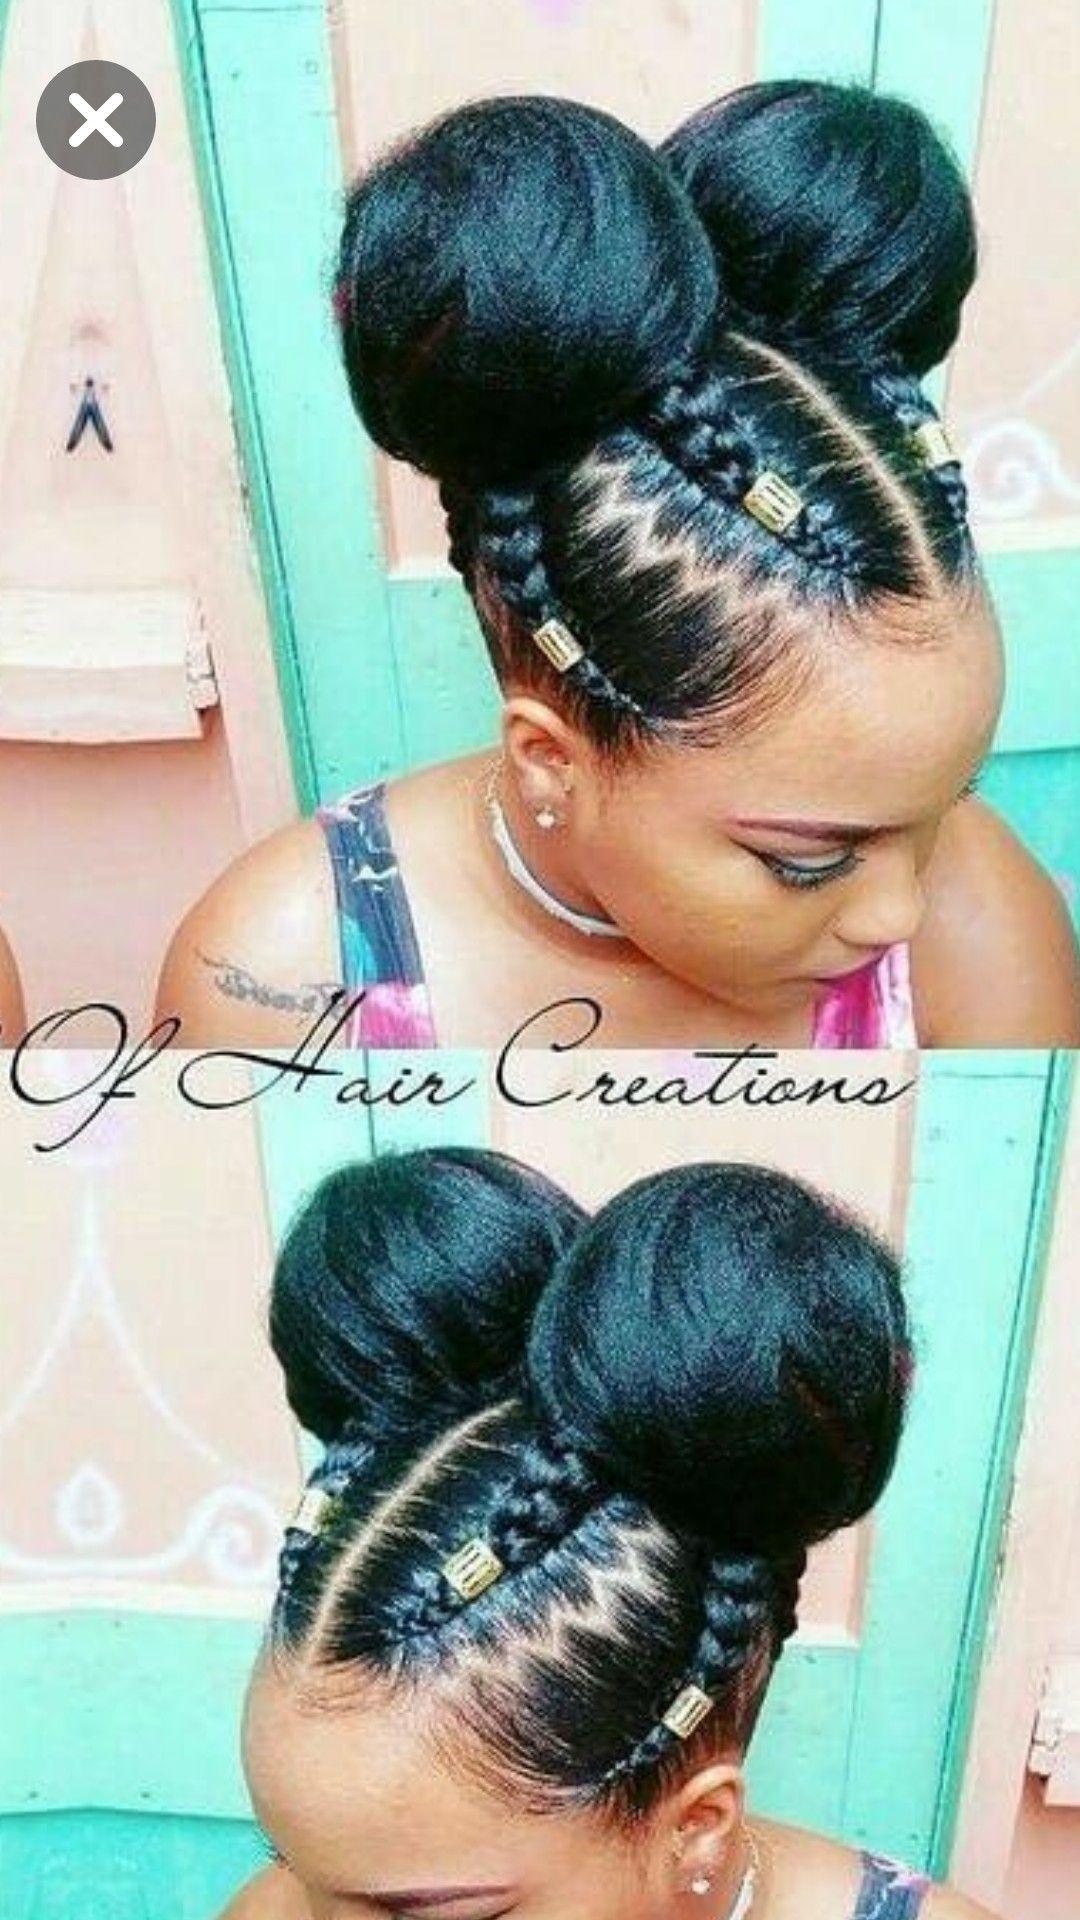 How To Create Ghana Cornrow Braids For Beginners hairstyleforblackwomen.net 47